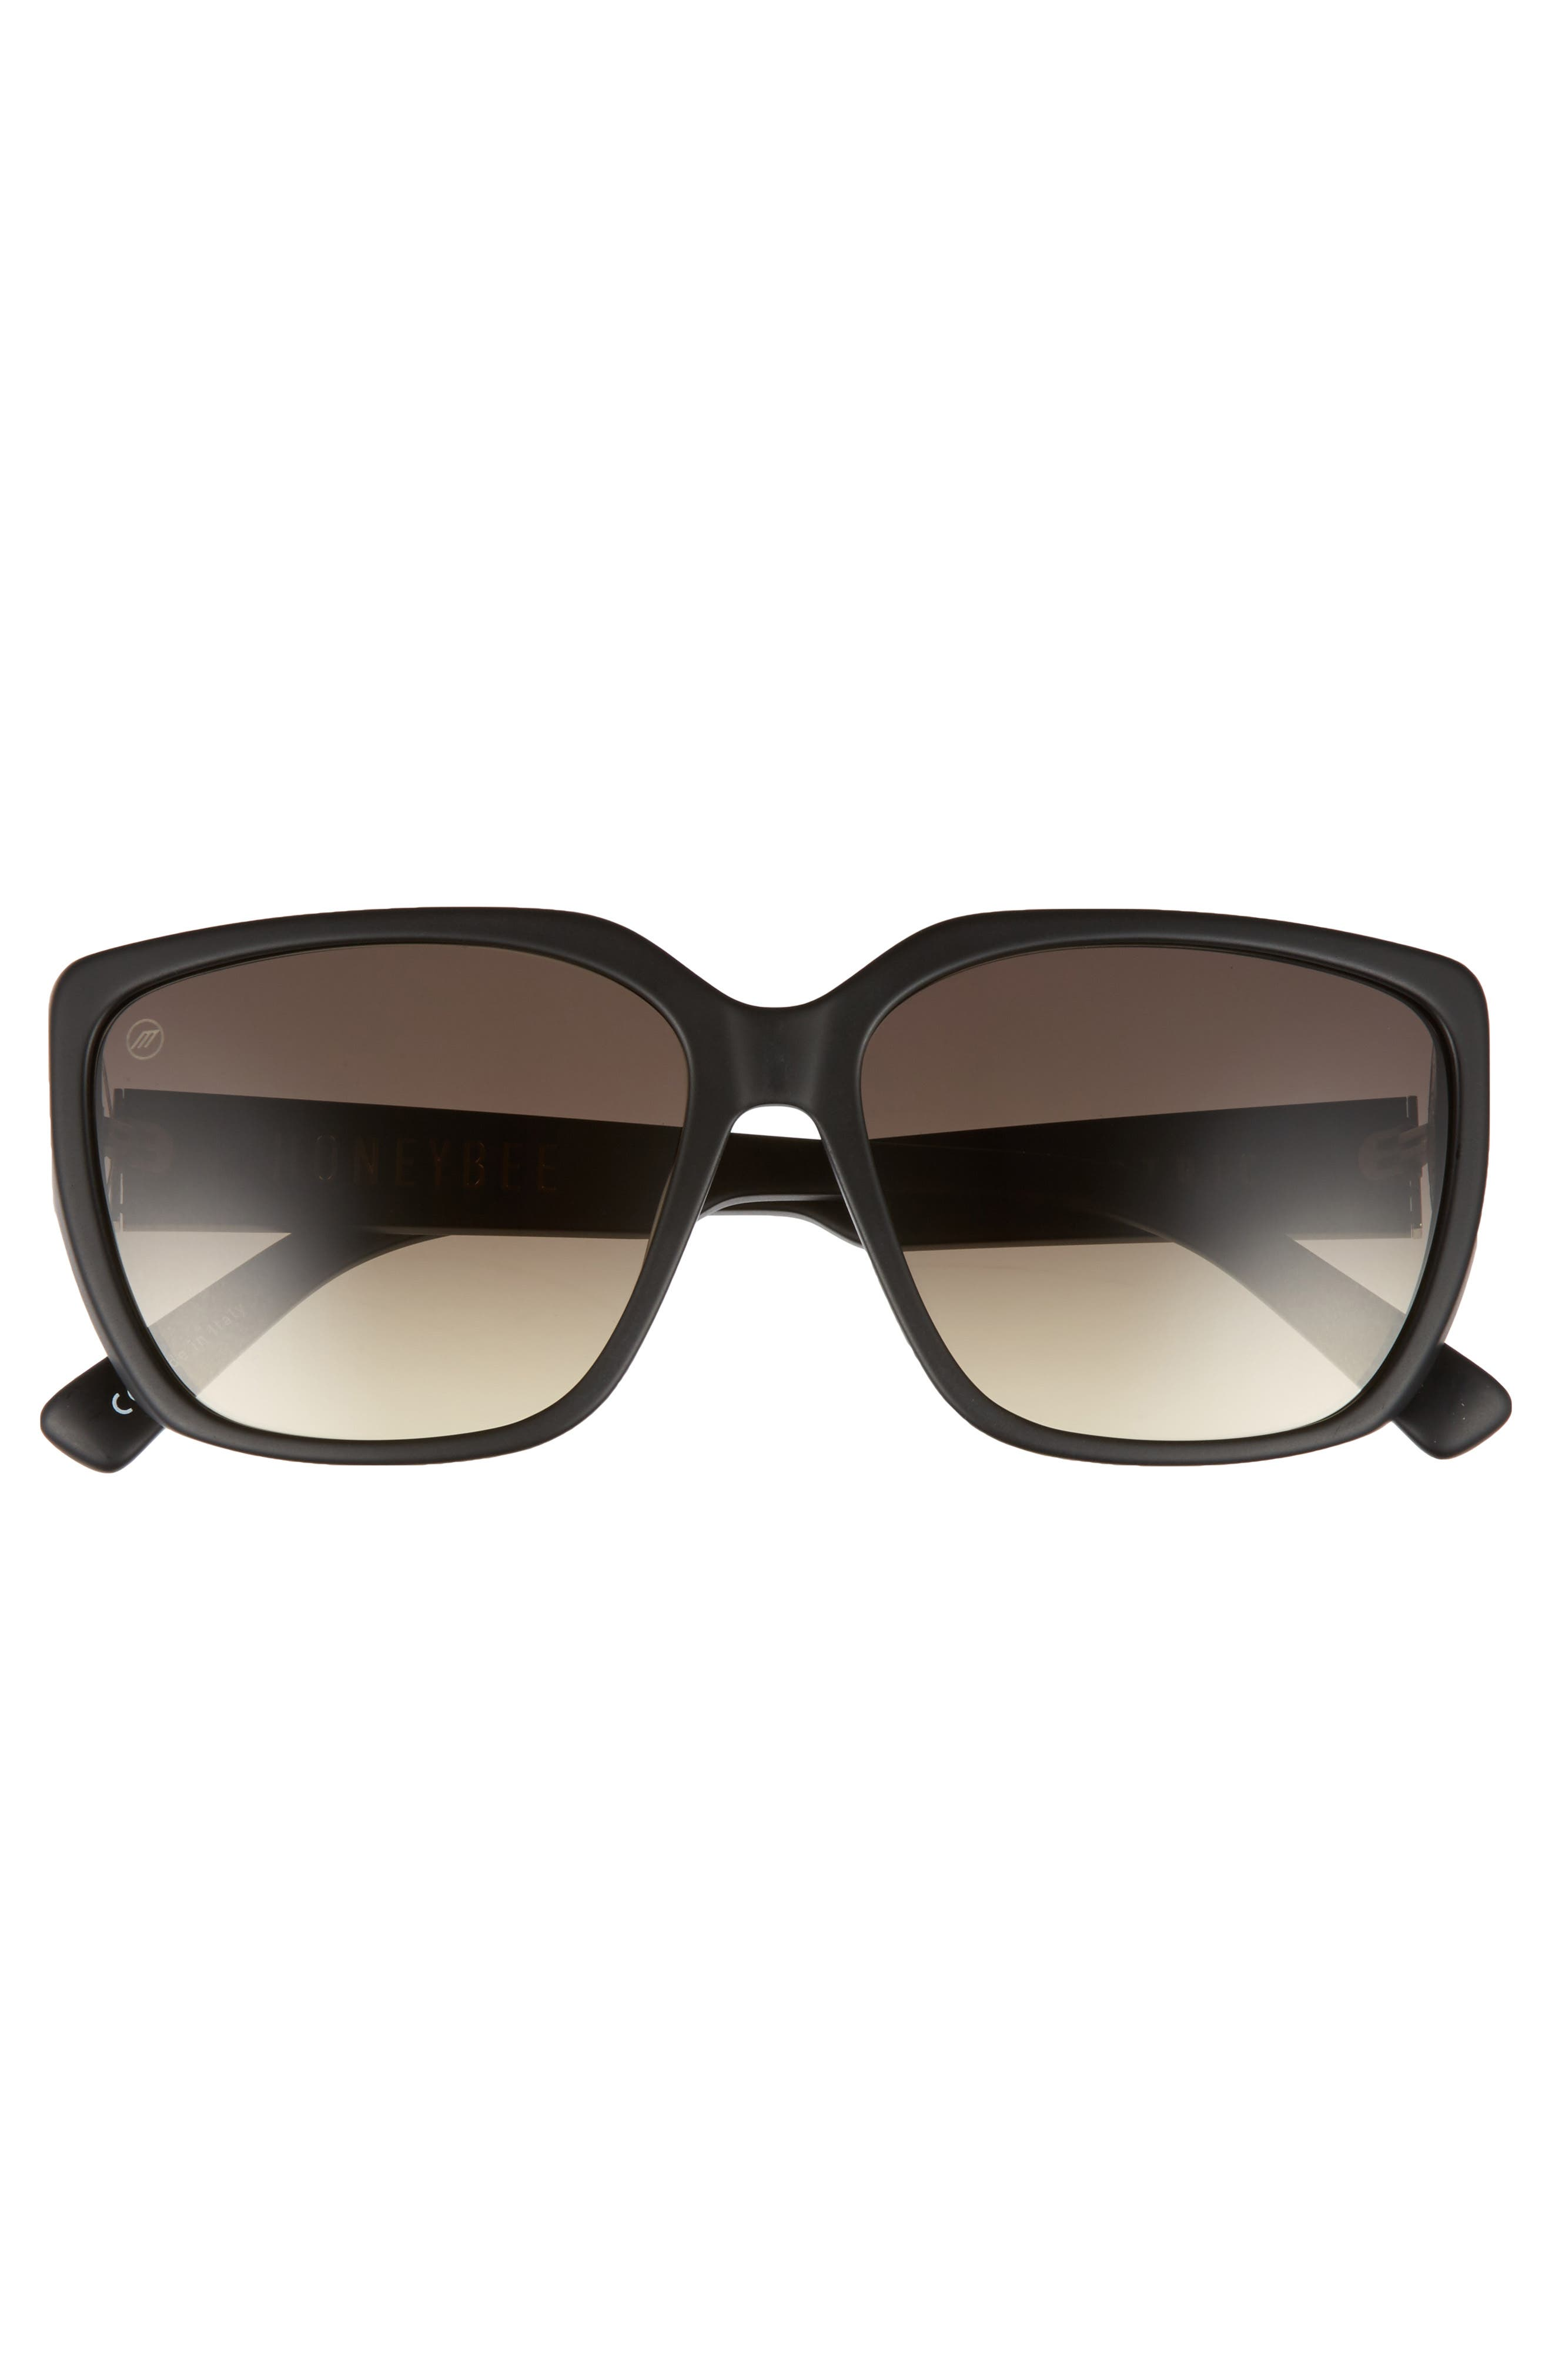 Honey Bee 60mm Mirrored Sunglasses,                             Alternate thumbnail 4, color,                             Matte Black/ Black Gradient